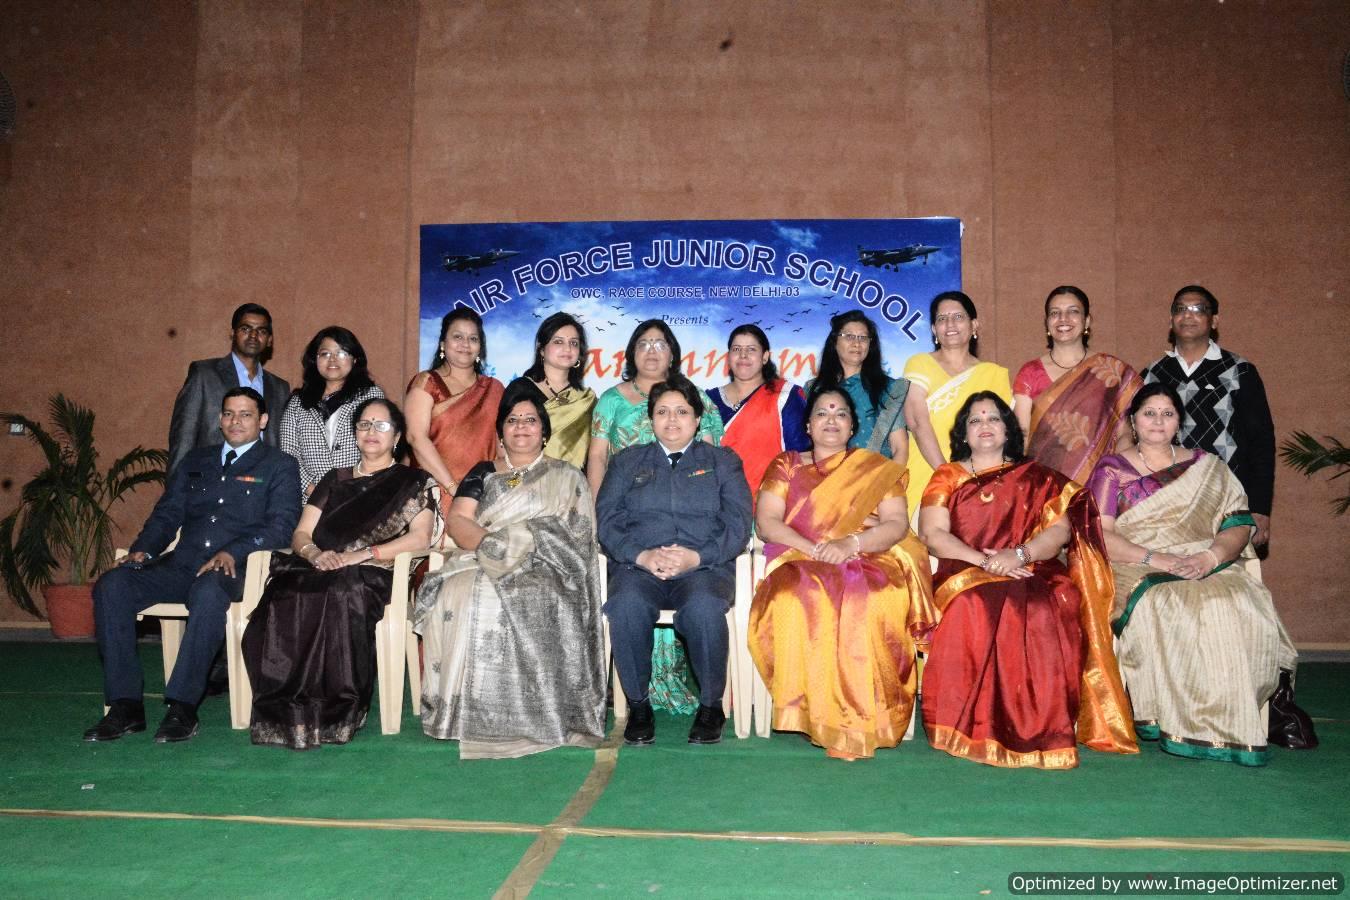 AFS Junior Staff Photo